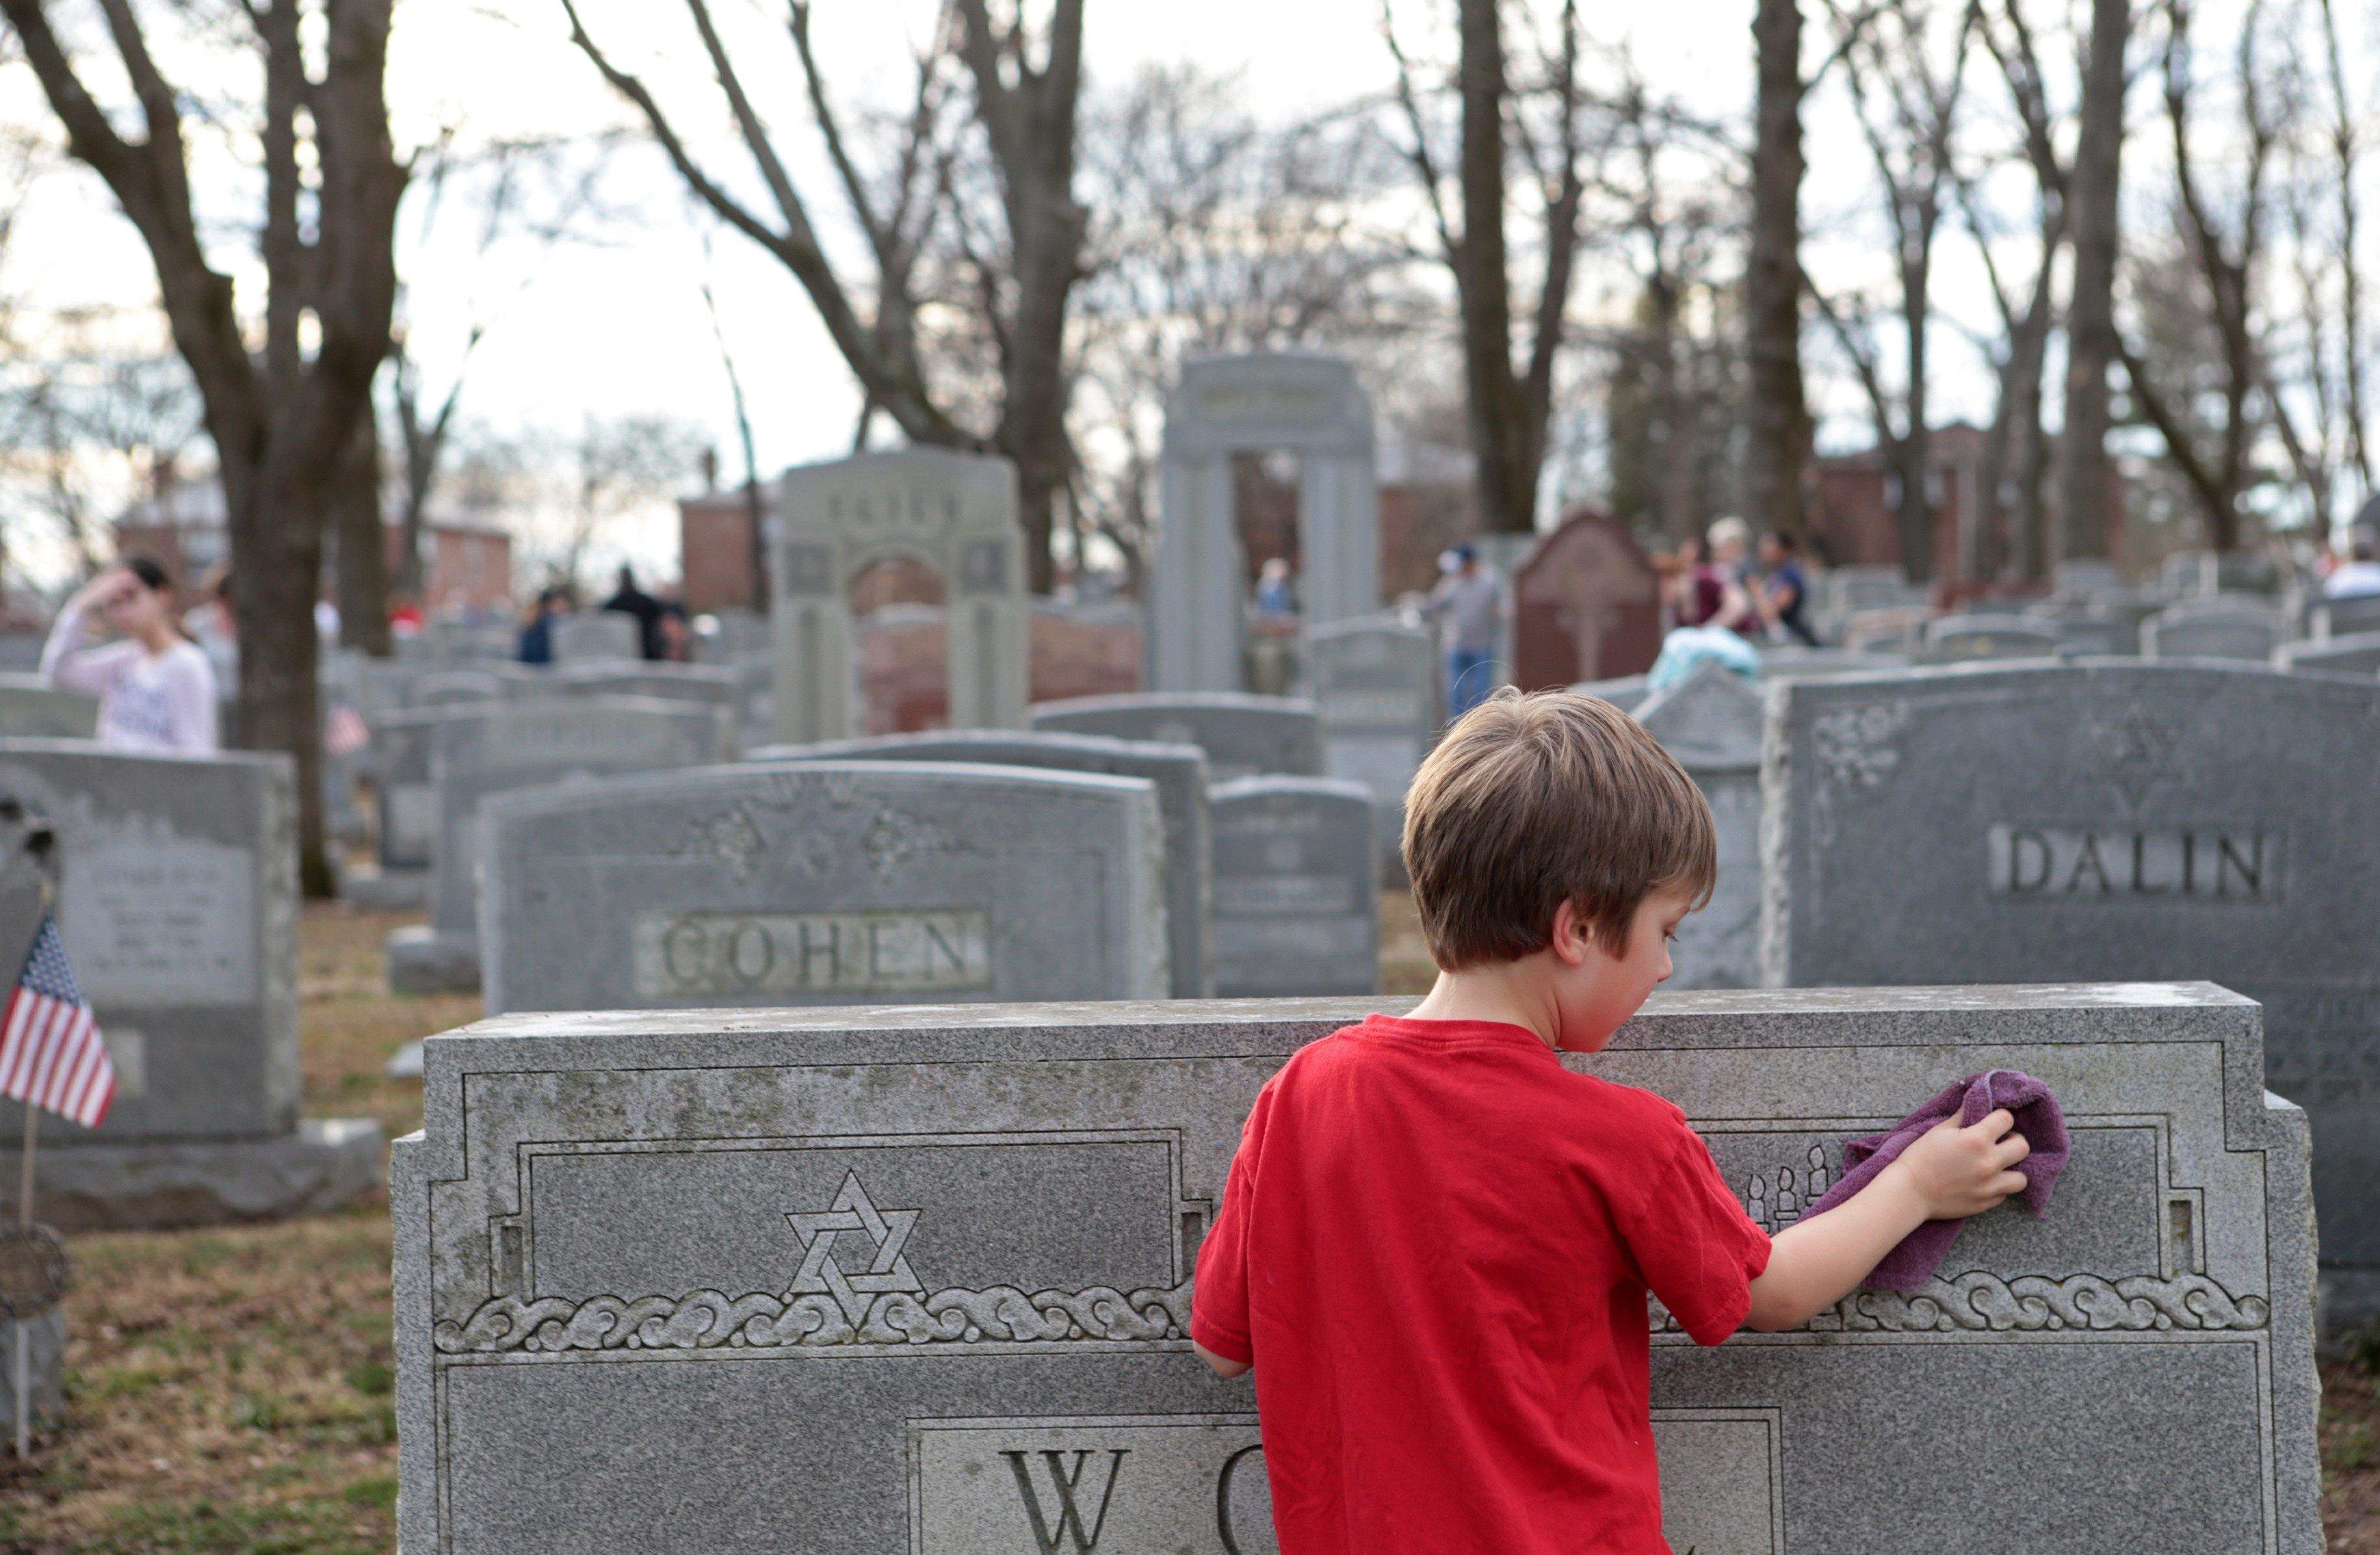 Muslim Fundraiser to Repair Jewish Cemetery Raises $100k